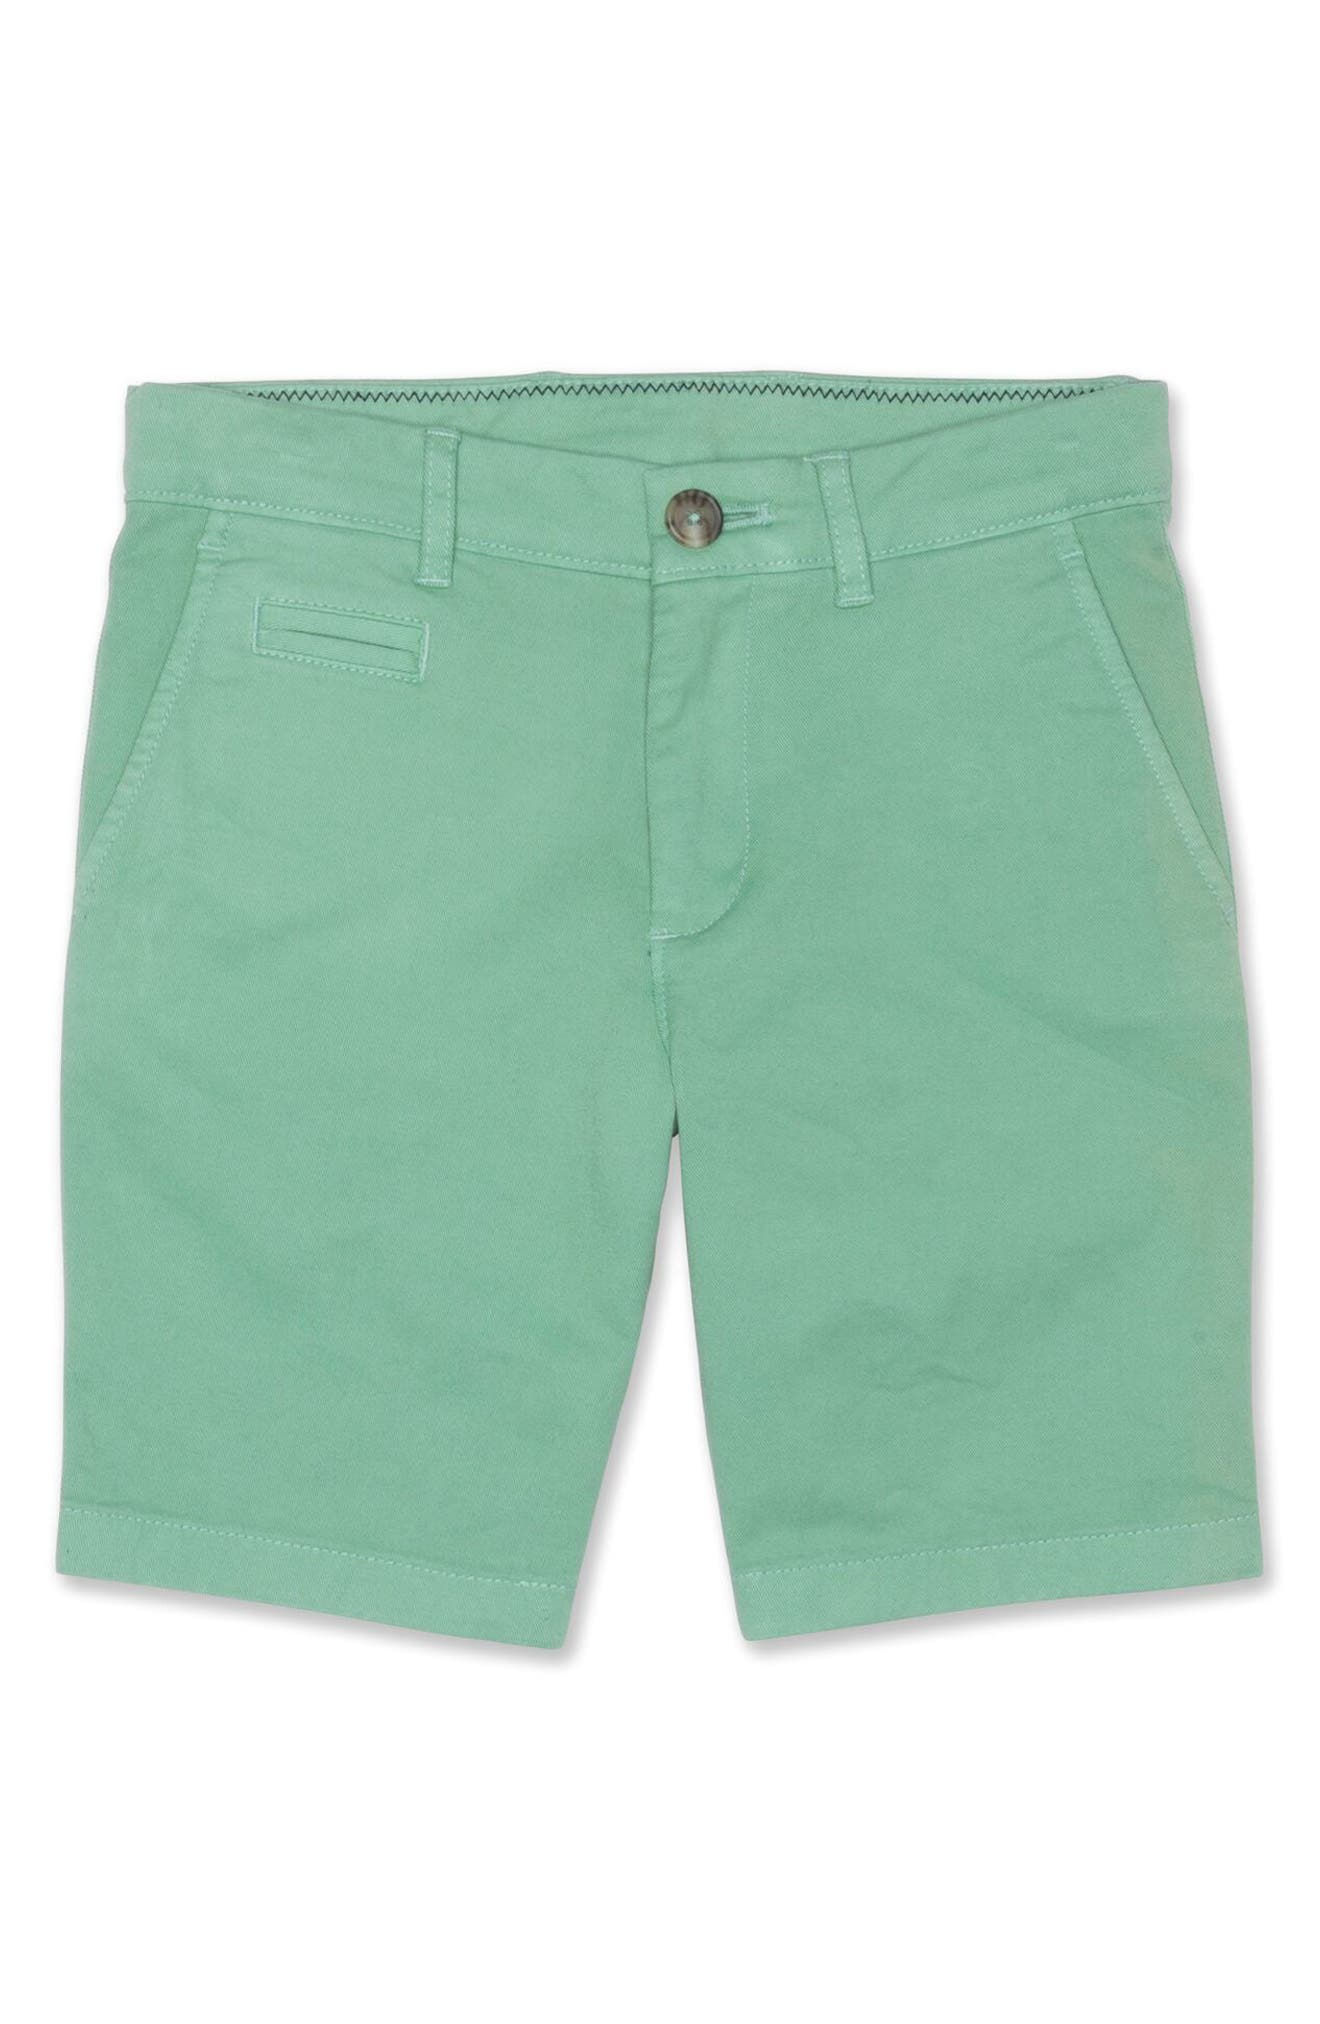 Neal Twill Shorts,                         Main,                         color, Kiwi